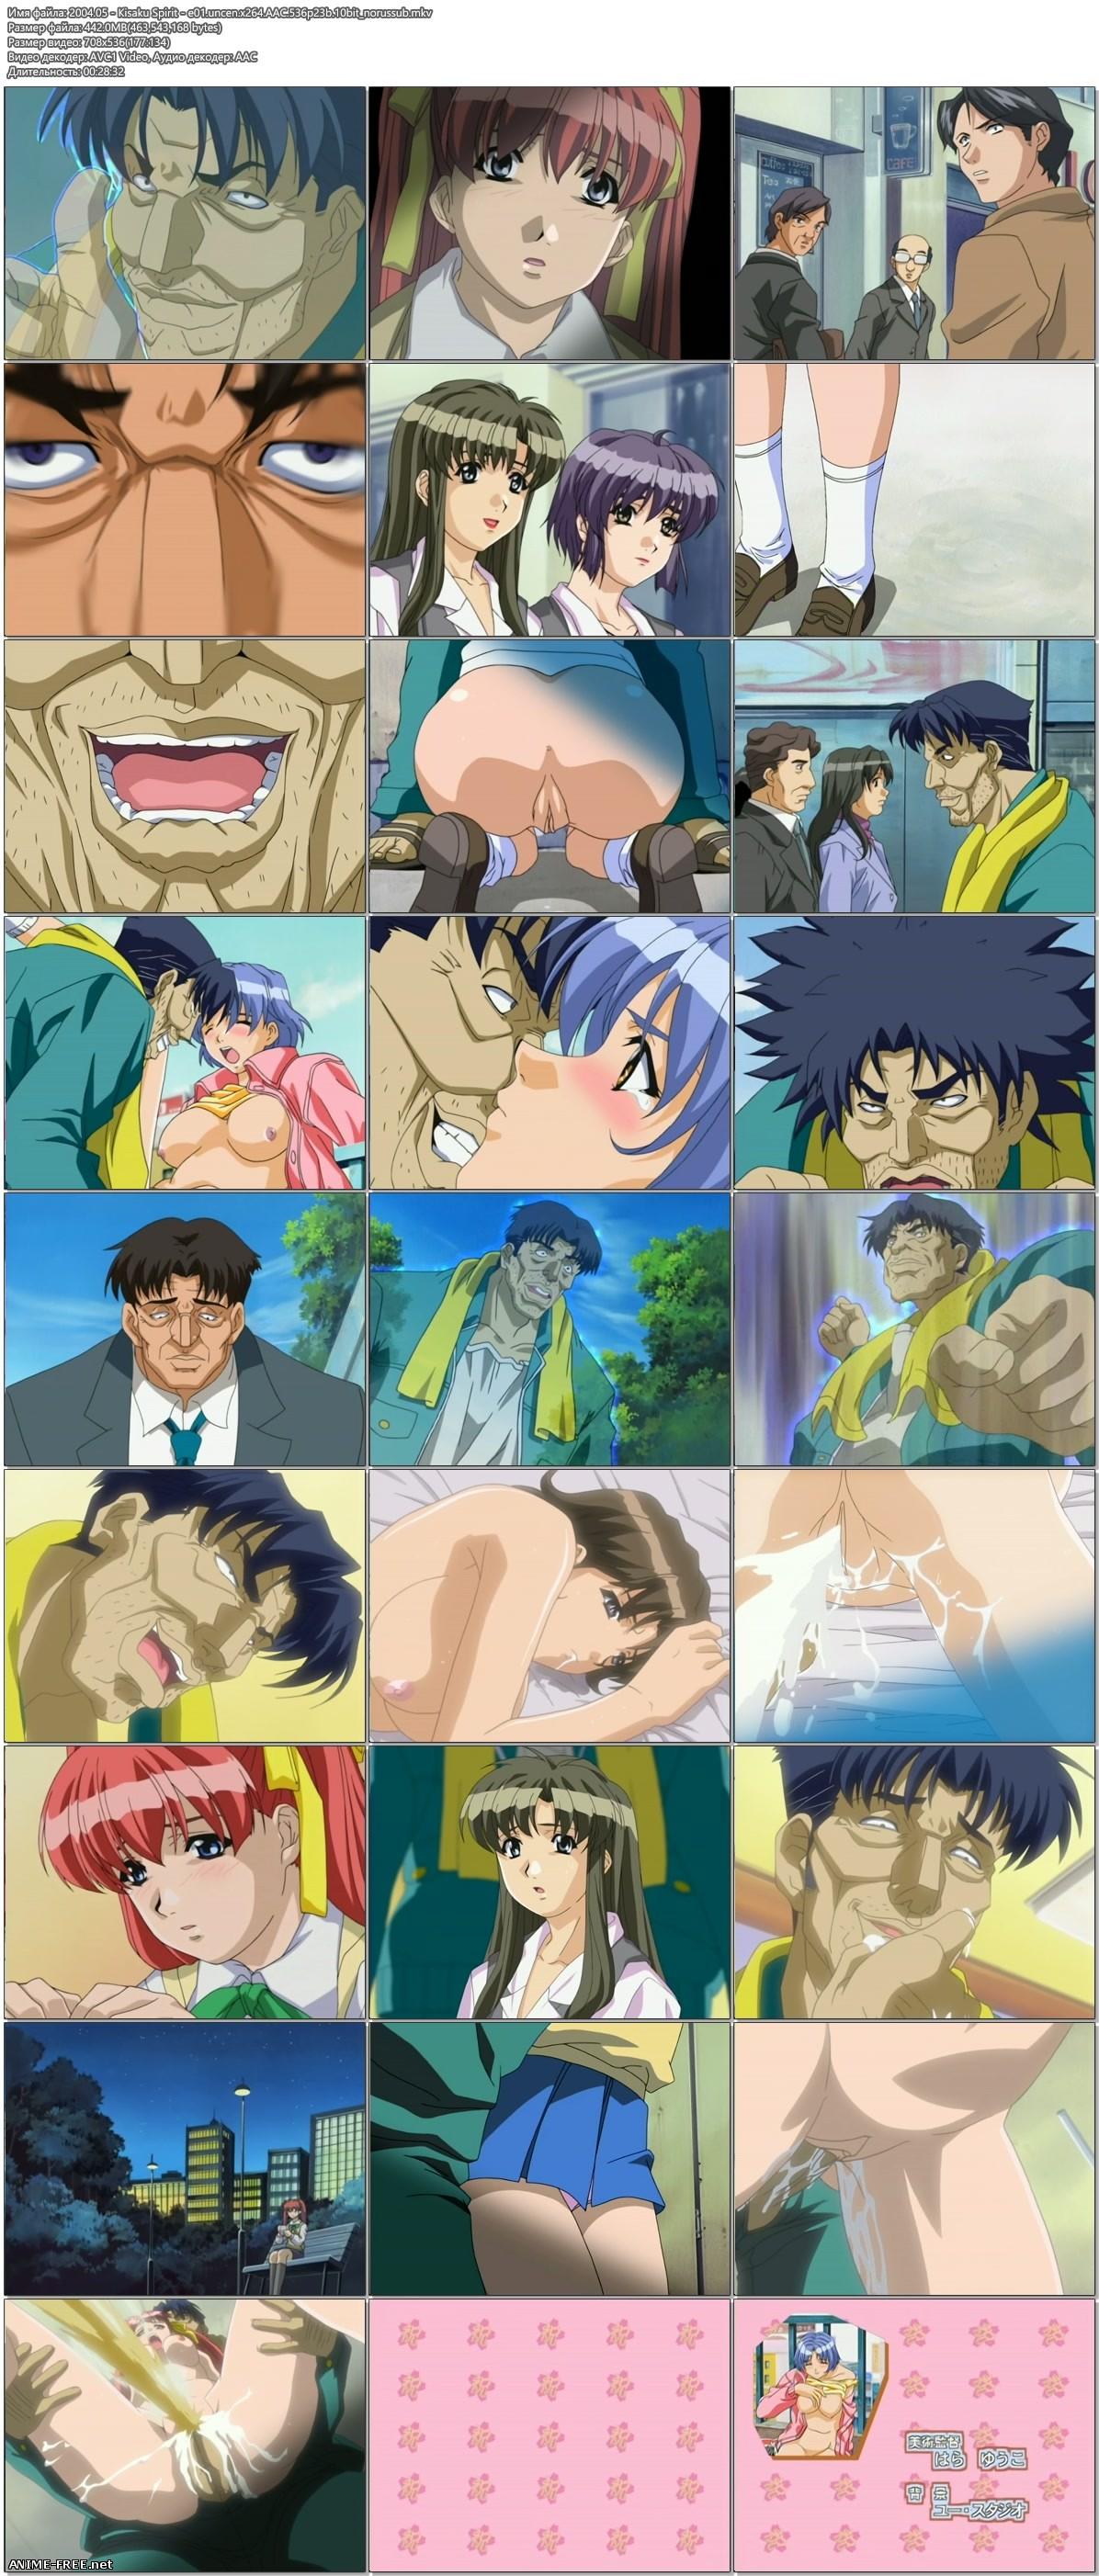 Kisaku [ep. 1-6 of 6] / Kisaku Spirit [ep. 1-3 of 3] [RUS,ENG,JAP] Anime Hentai